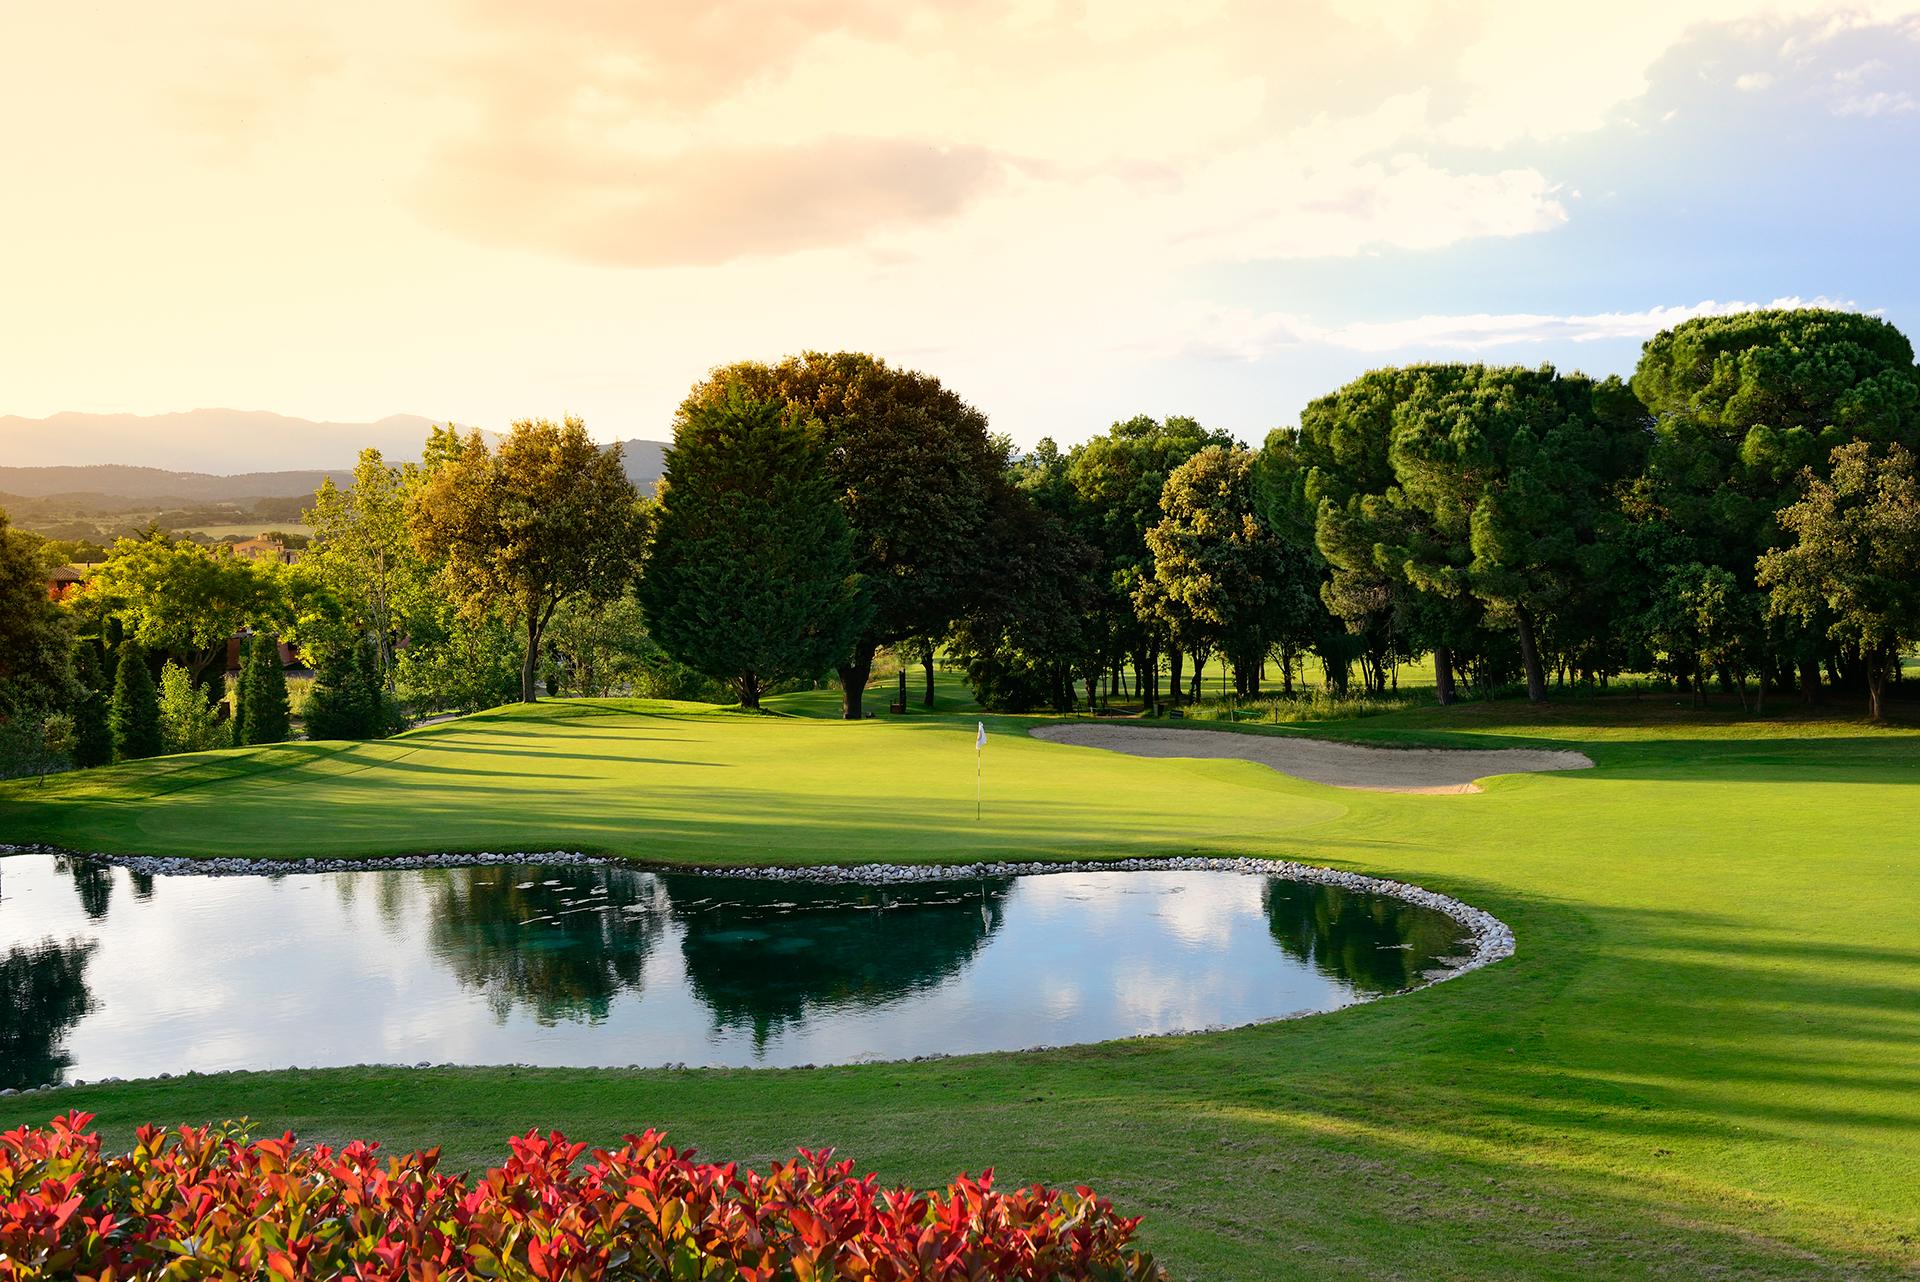 Golf-Expedition-Golf-reizen-Spanje-Regio-Barcelona-TorreMirona-Golf-&-Spa-Resort-golf-course-lake